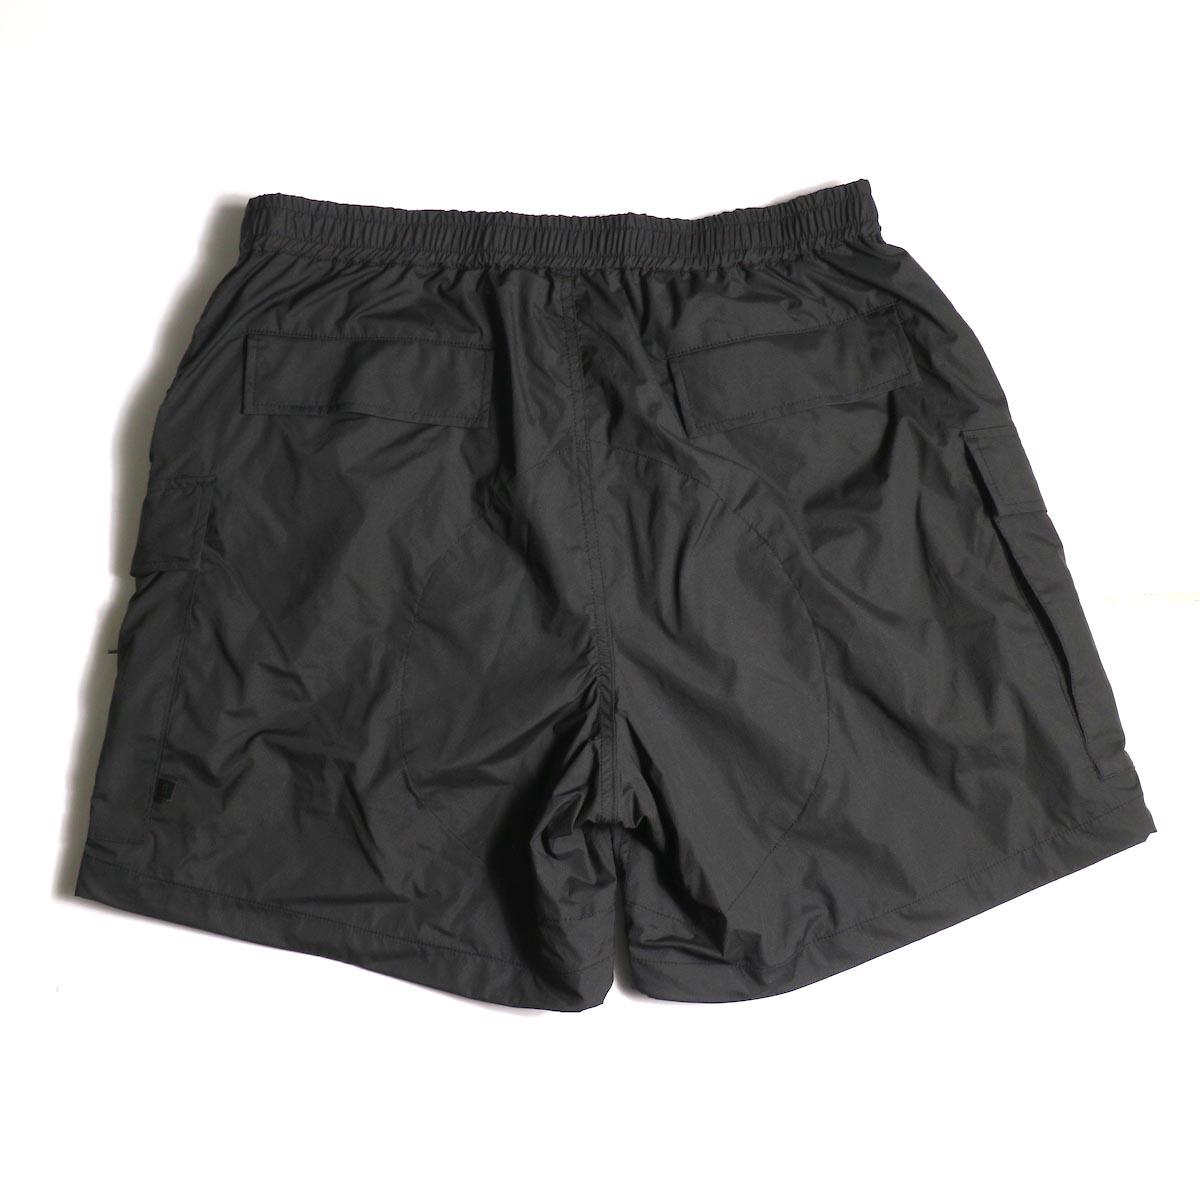 DAIWA PIER39 / Micro Rip-Stop Easy 6P Shorts (Black)背面